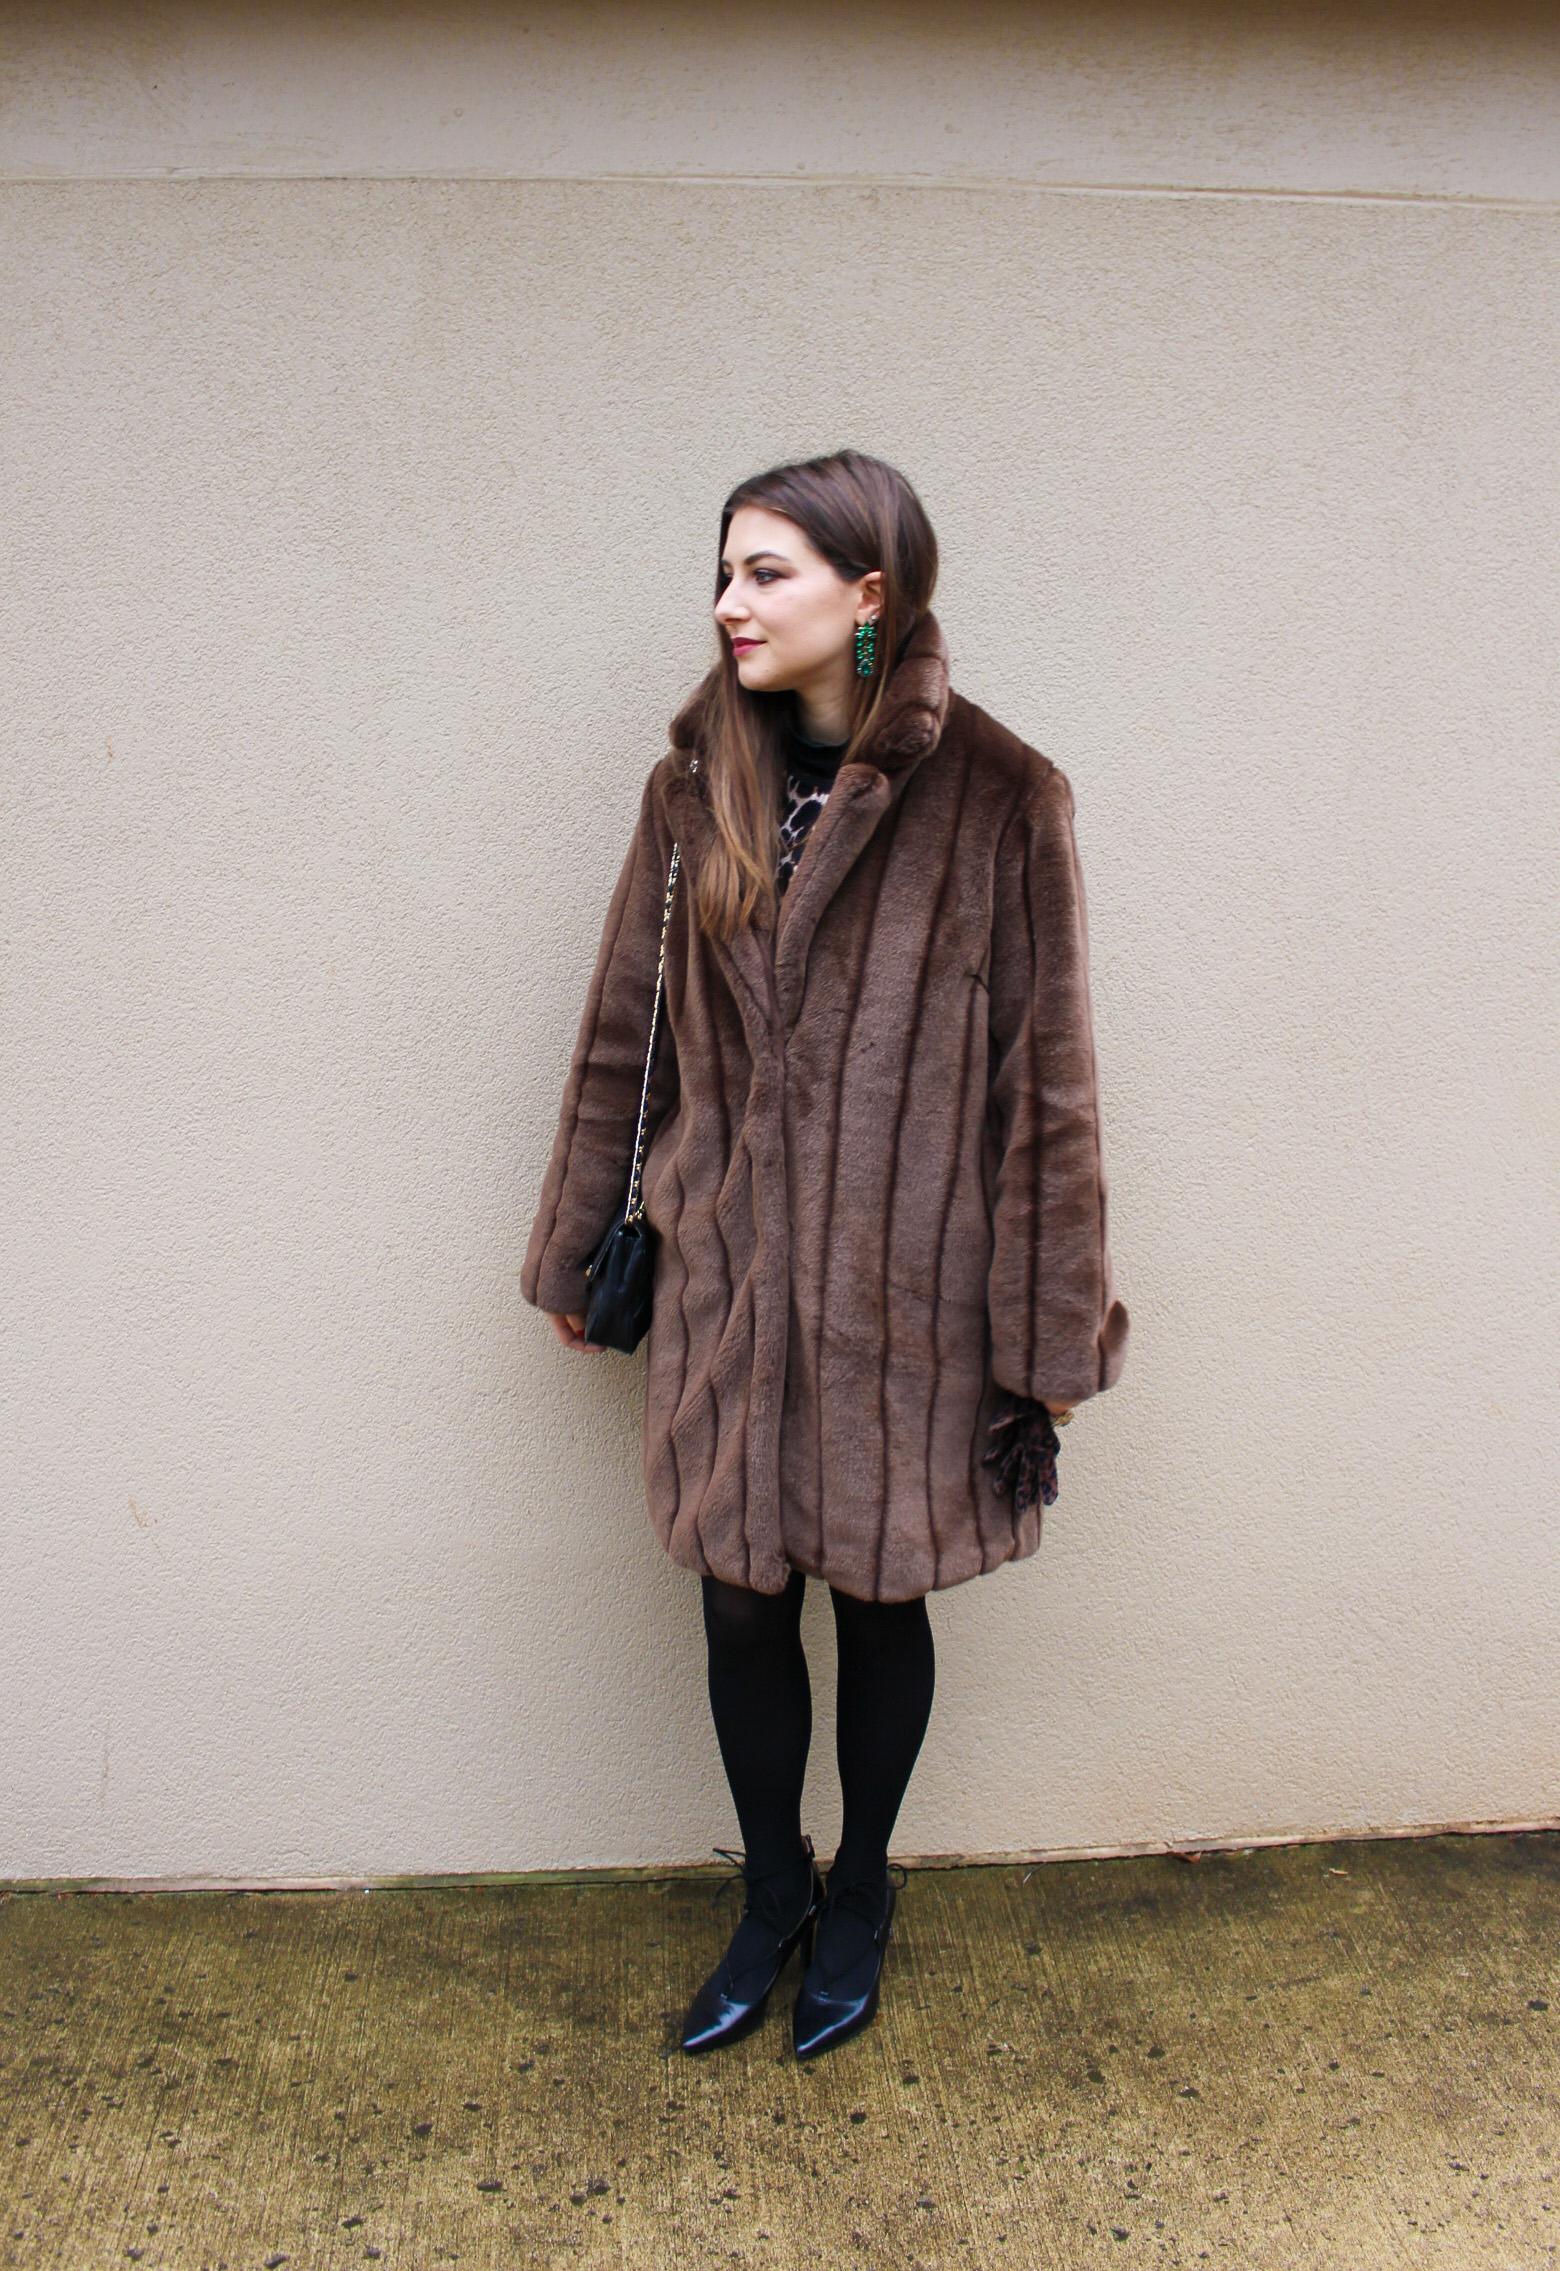 Modern Mod / leopard dress, faux fur coat / nicolemcaruso.com